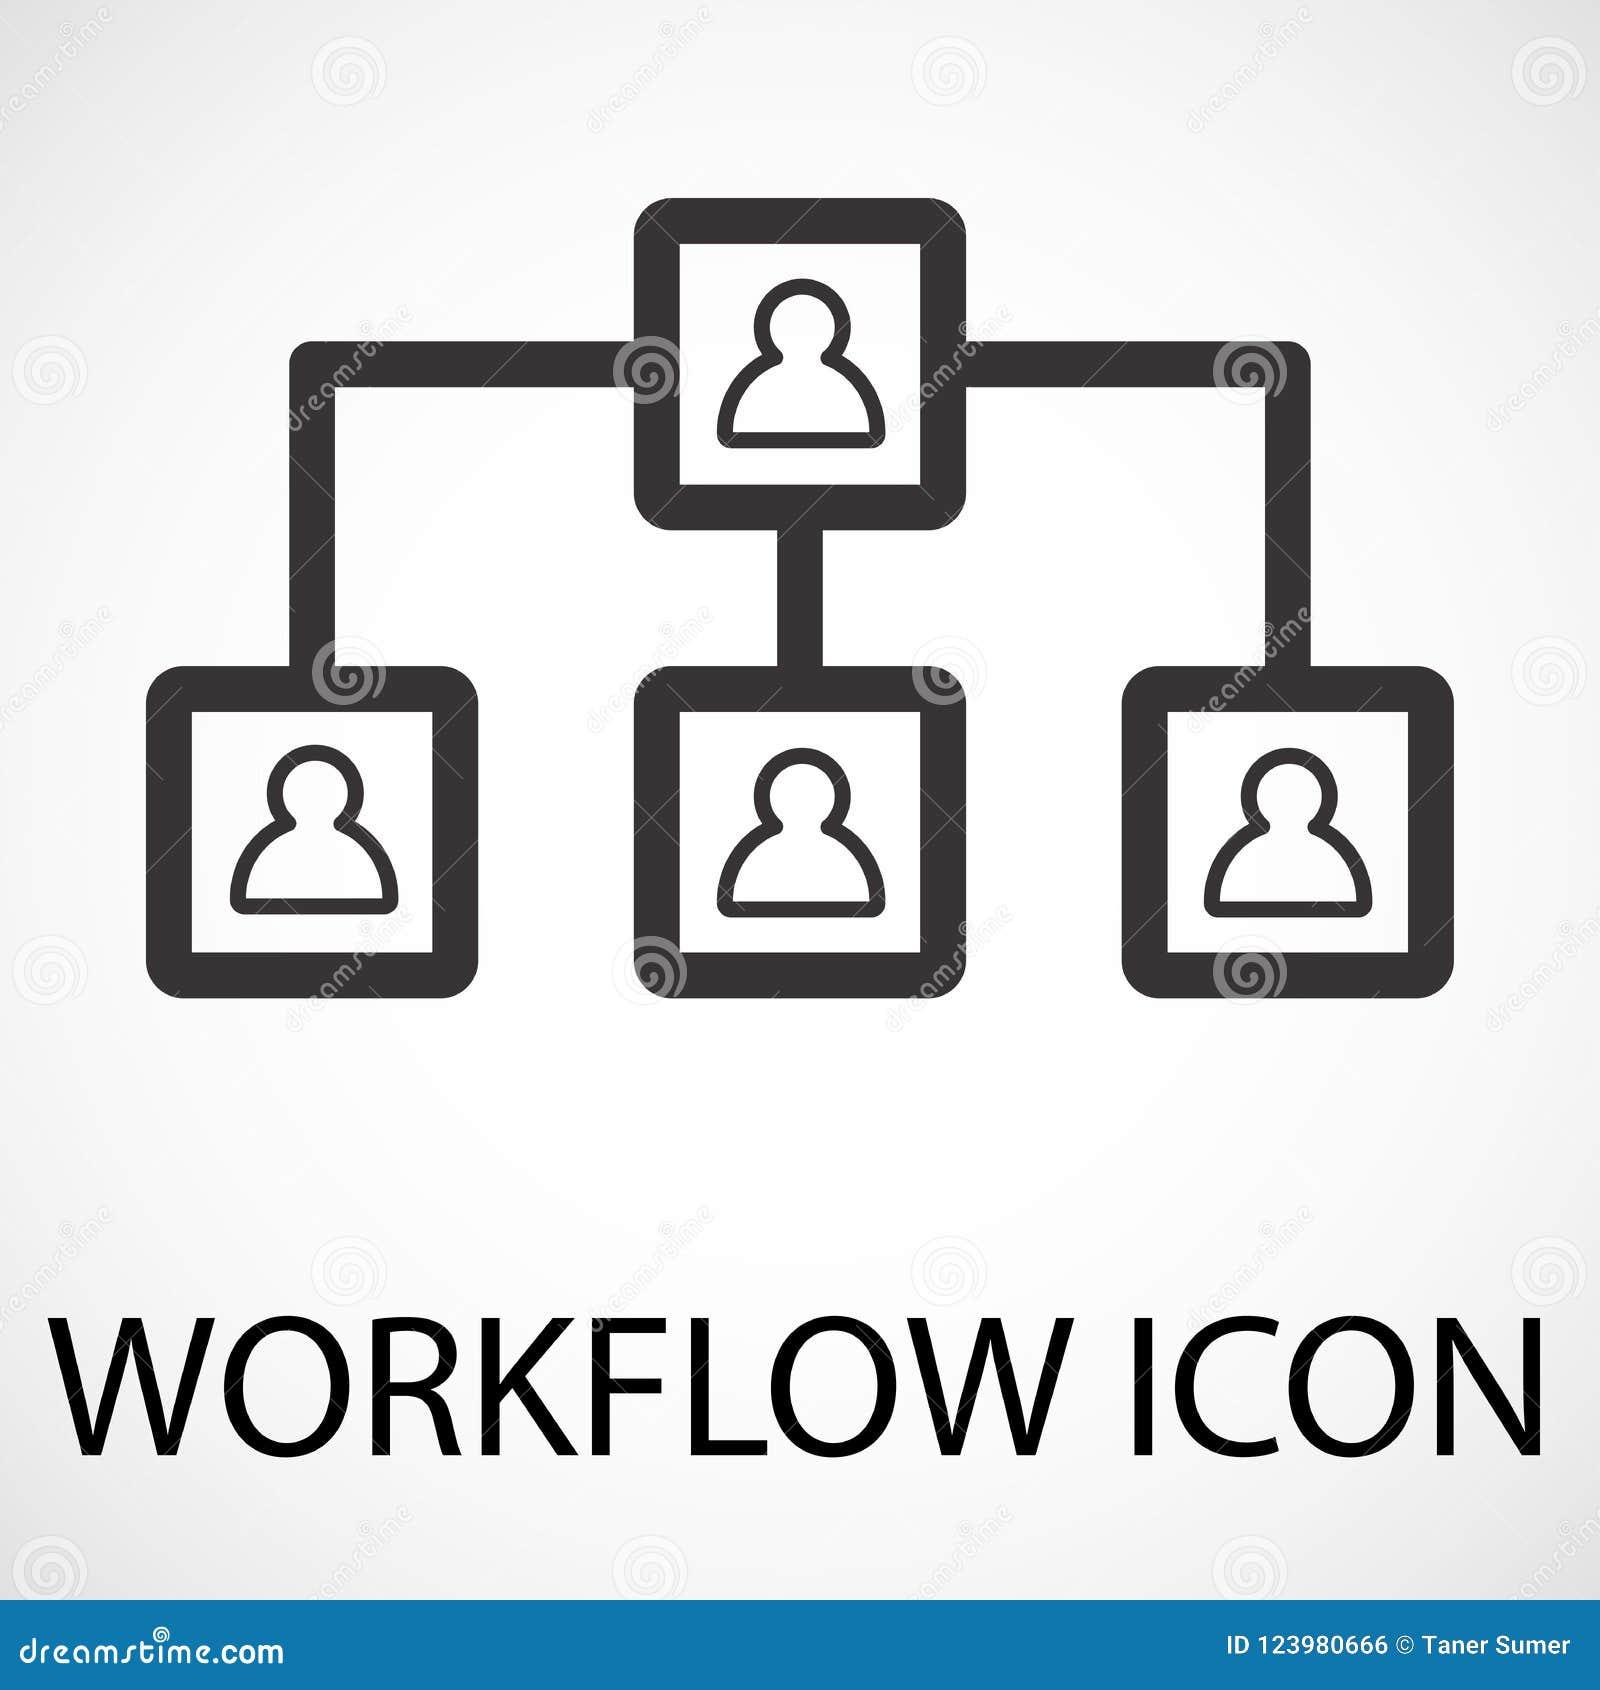 Simple workflow line art icon, vector